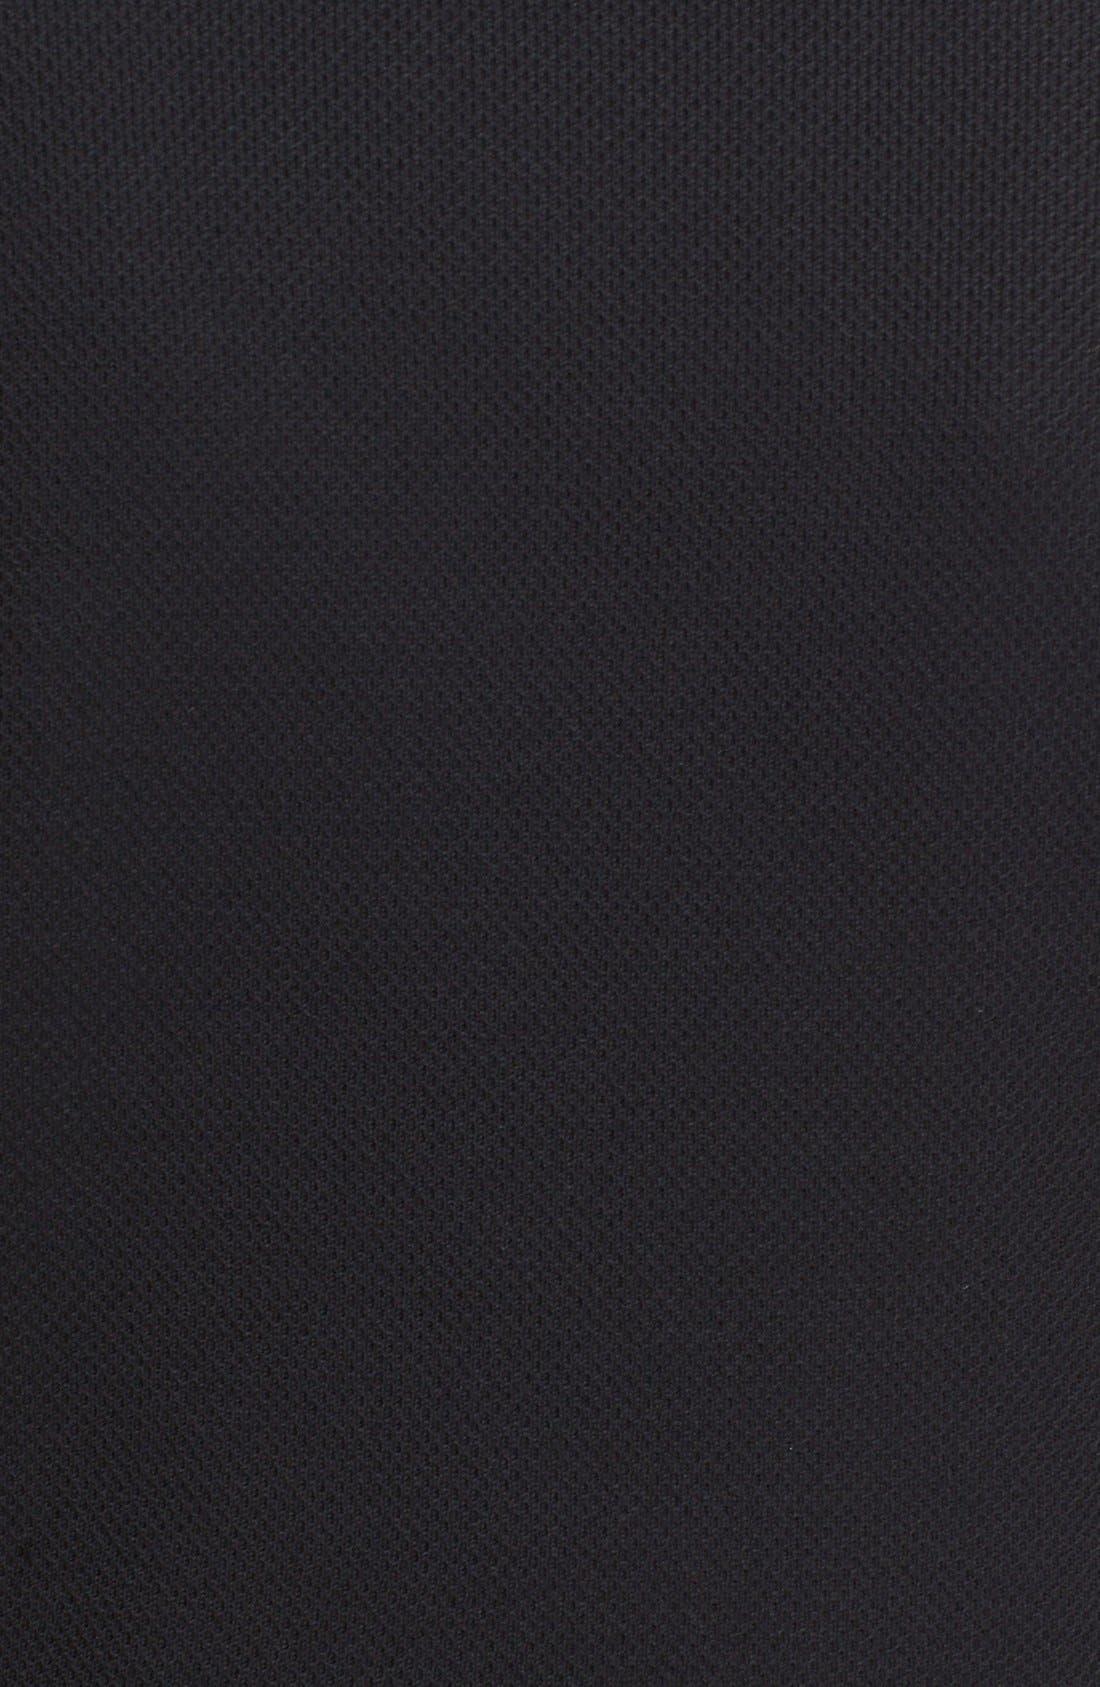 Micro Piqué Jacket,                             Alternate thumbnail 3, color,                             001